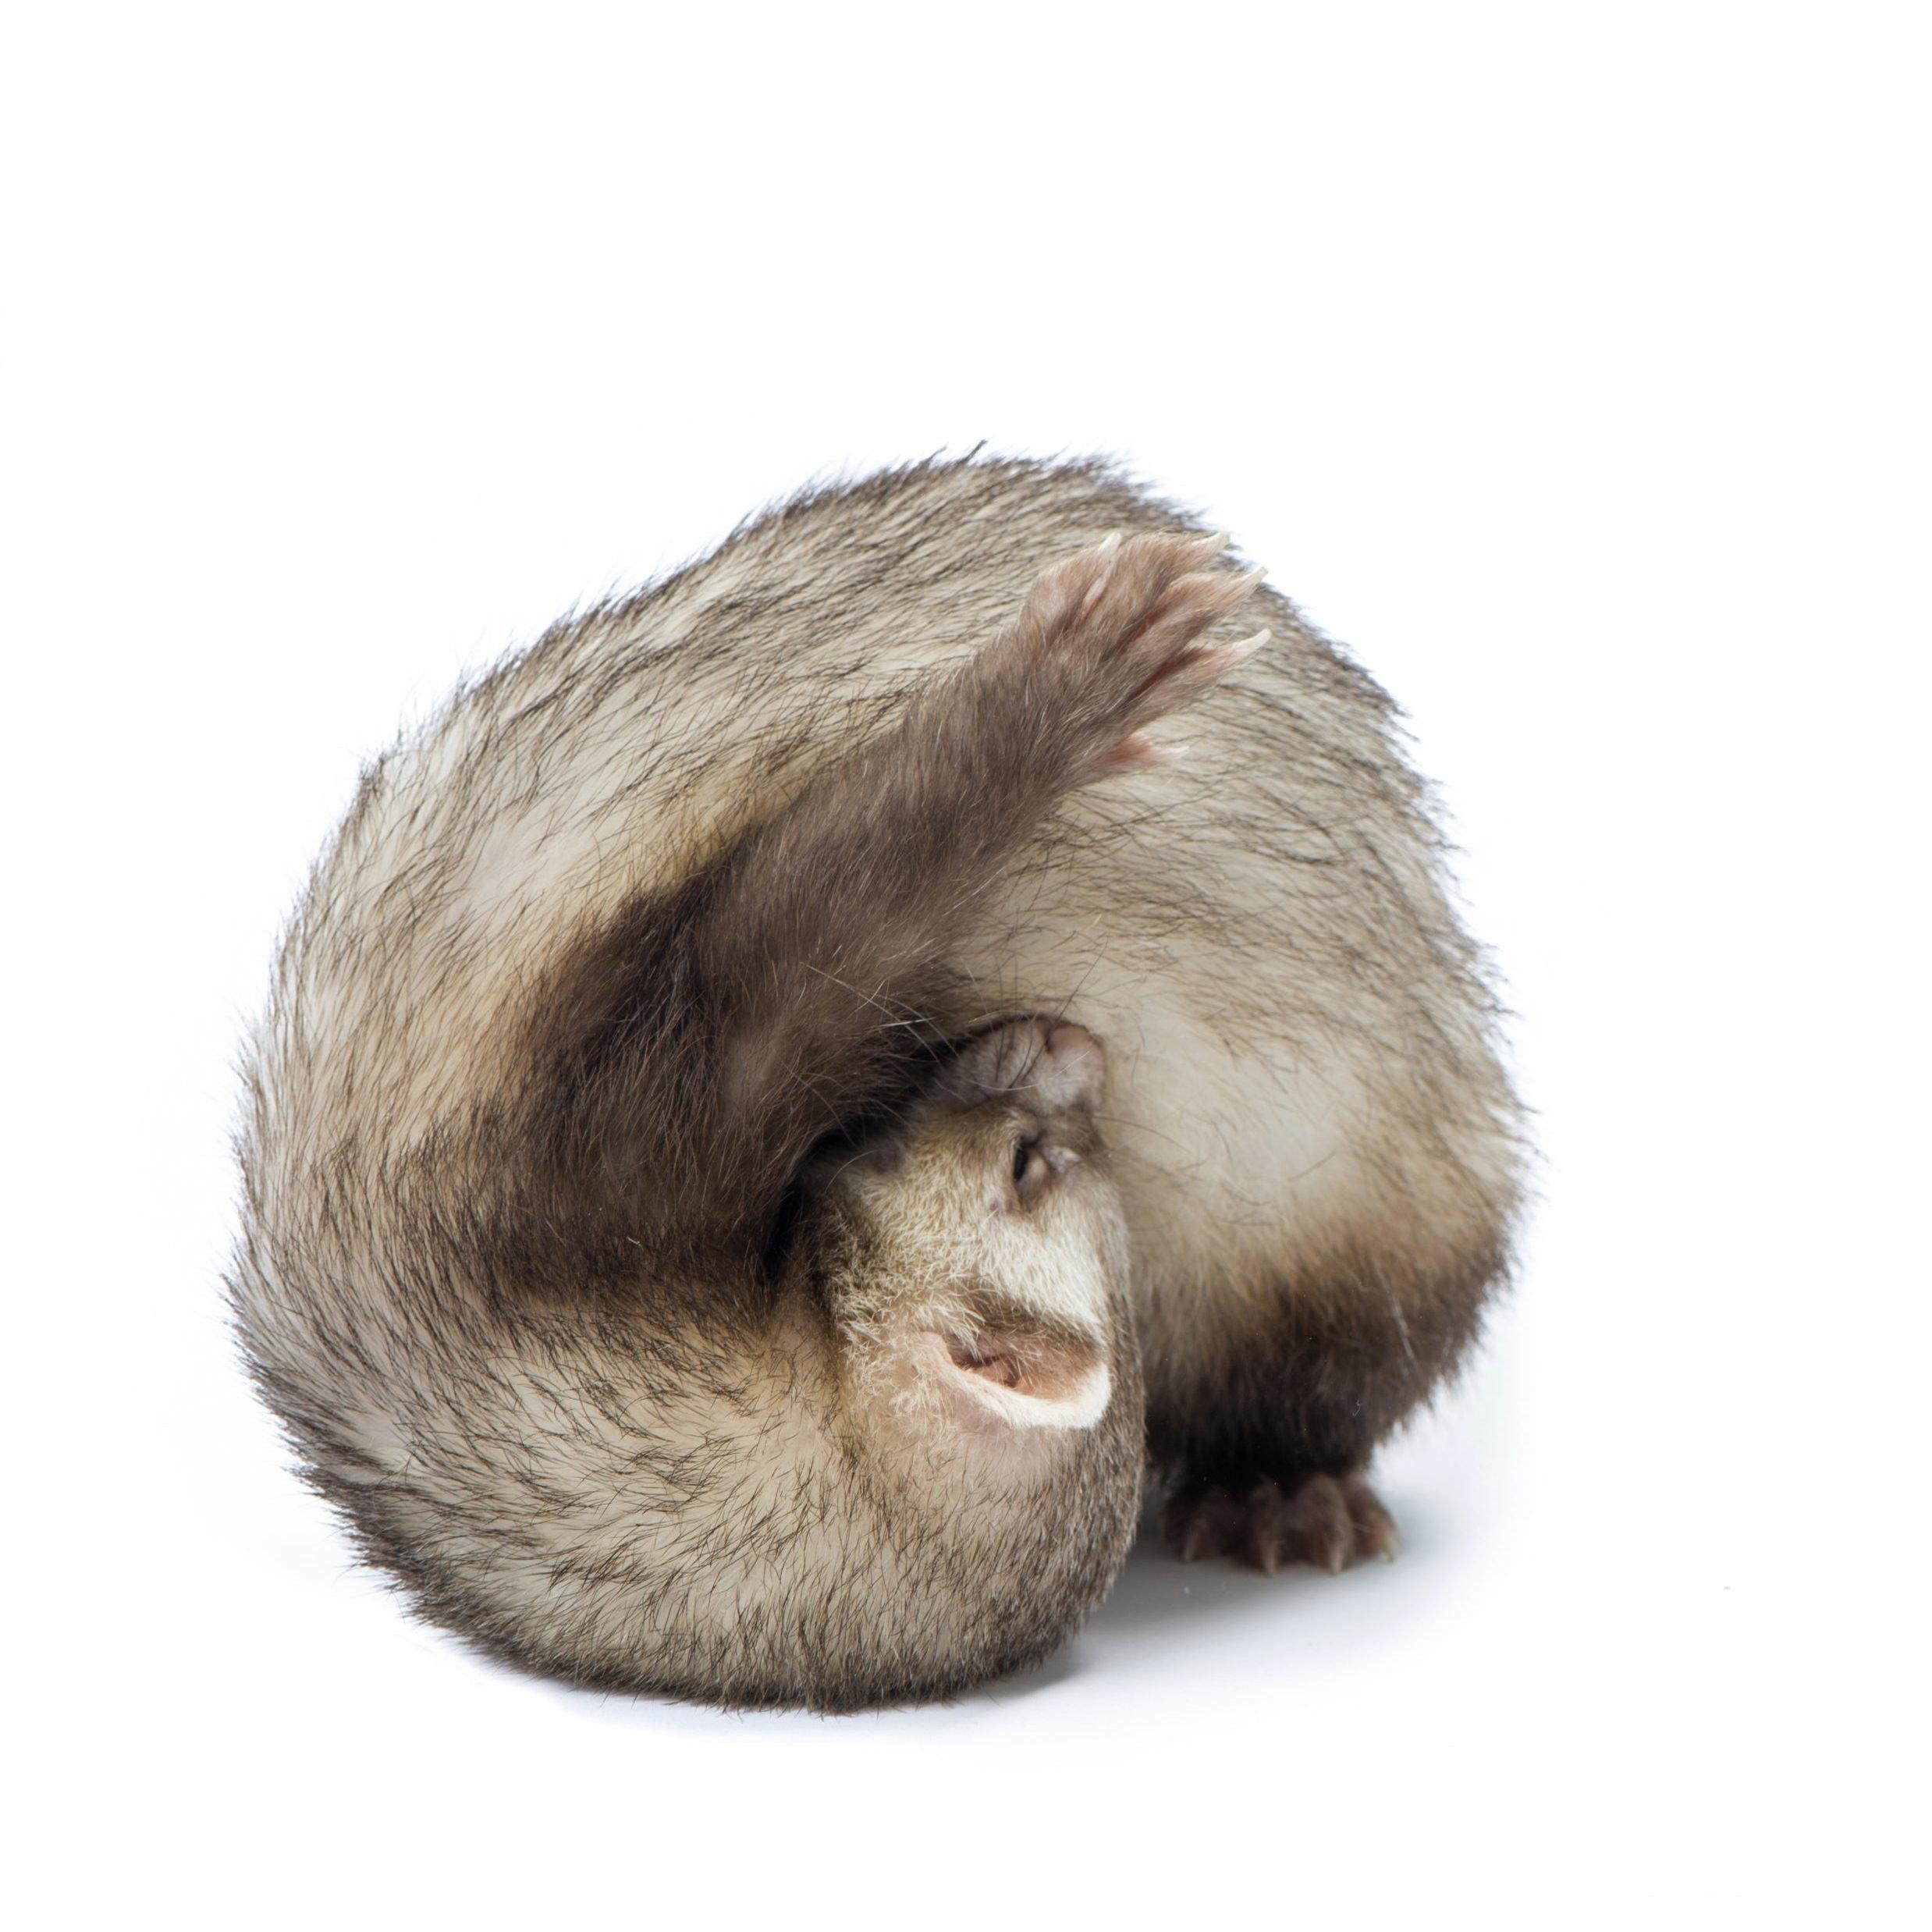 Studio shot of ferret stands in yoga asana isolated on white